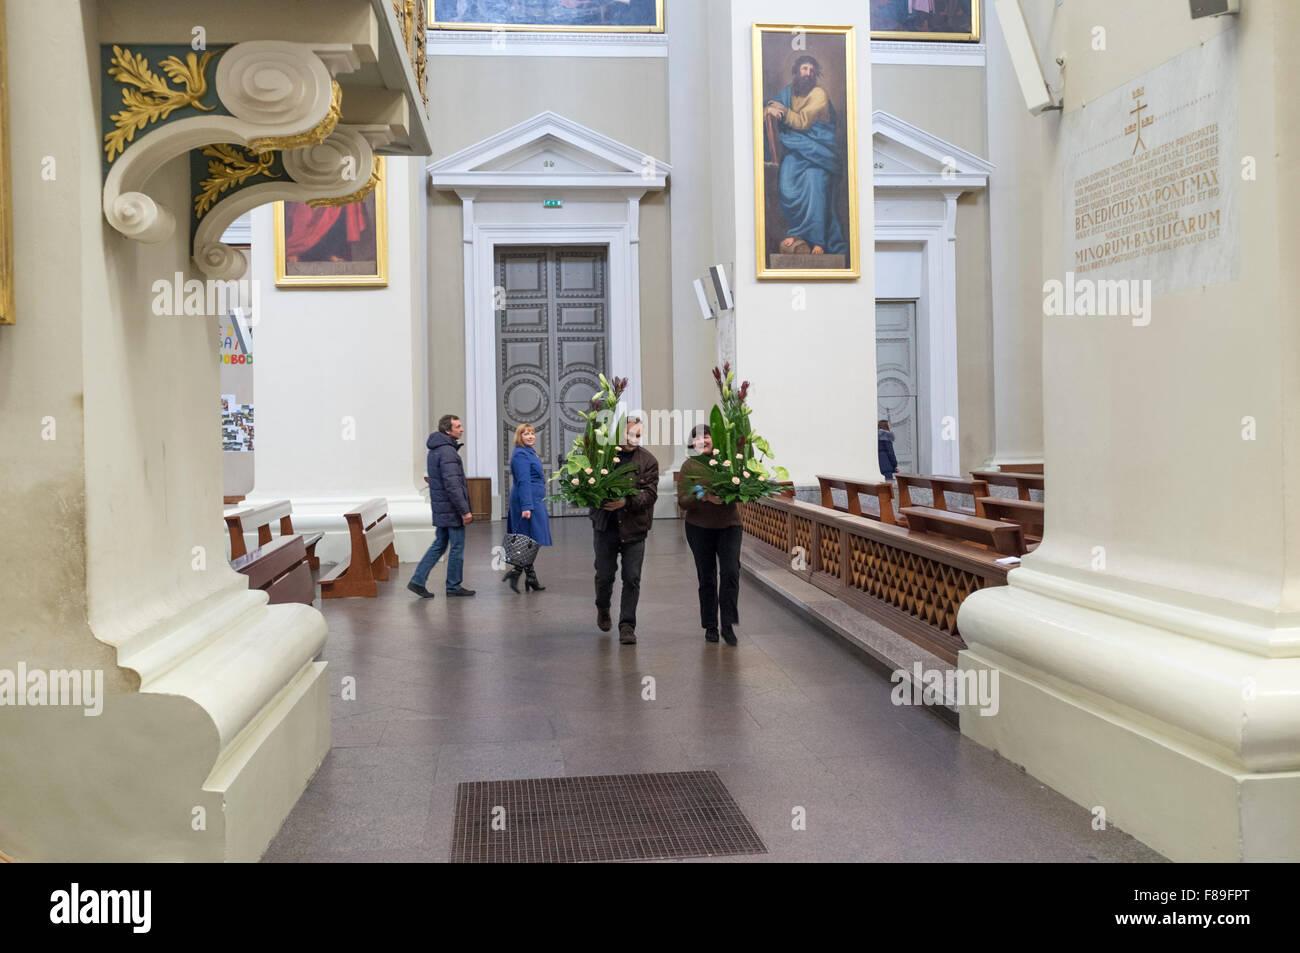 Interior of Vilnius Cathedral. Vilnius, Lithuania, Europe - Stock Image